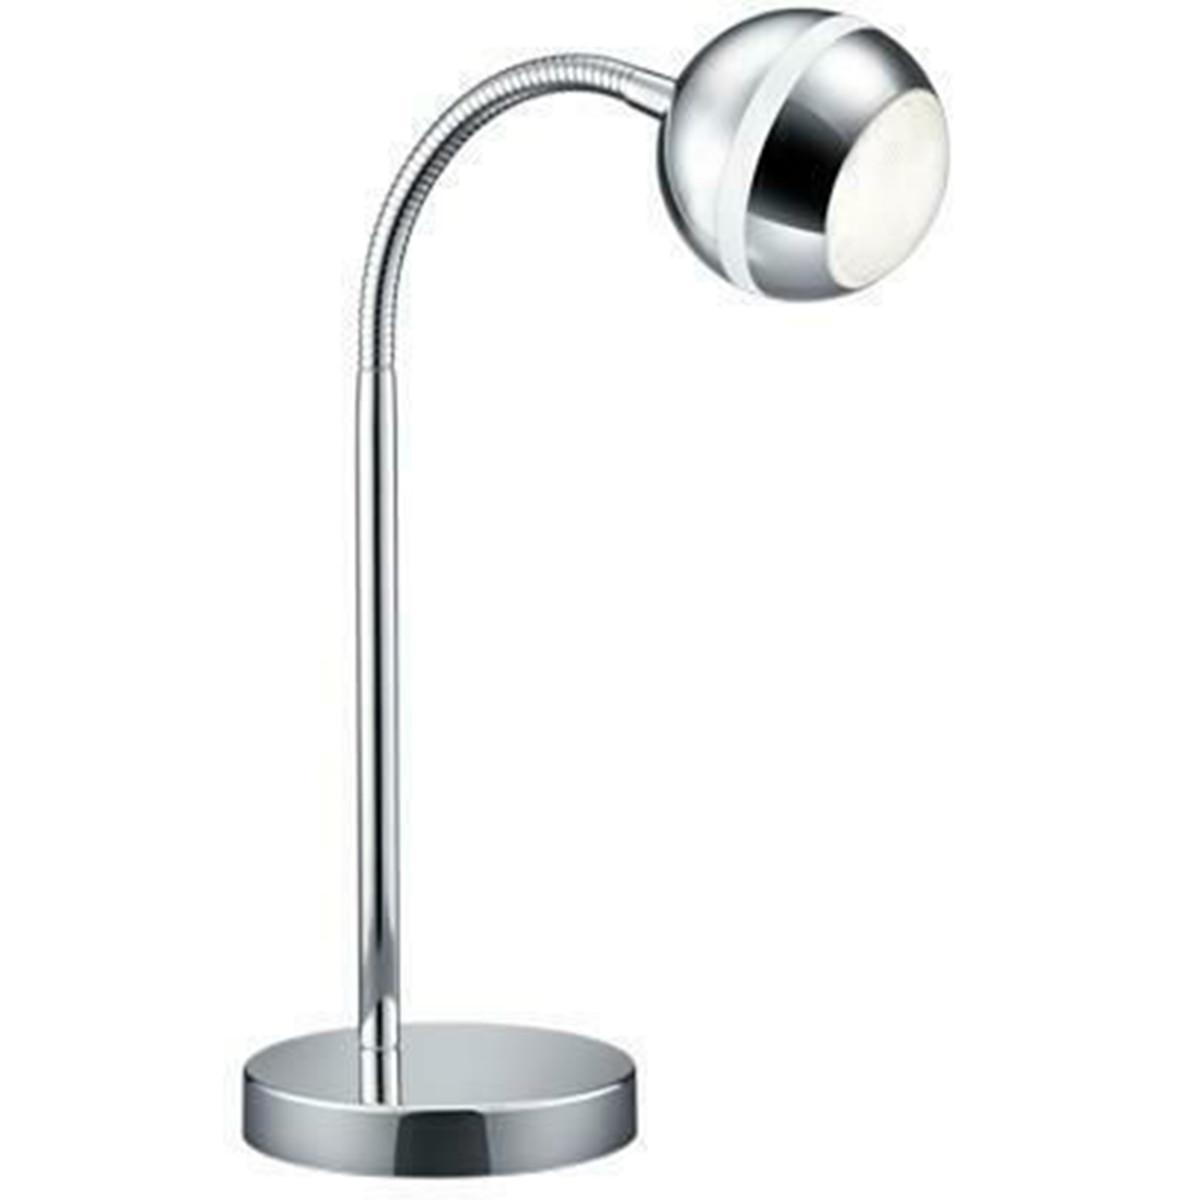 LED Tafellamp - Trion Bonaret - 3W - Warm Wit 3100K - Rond - Glans Chroom - Alum